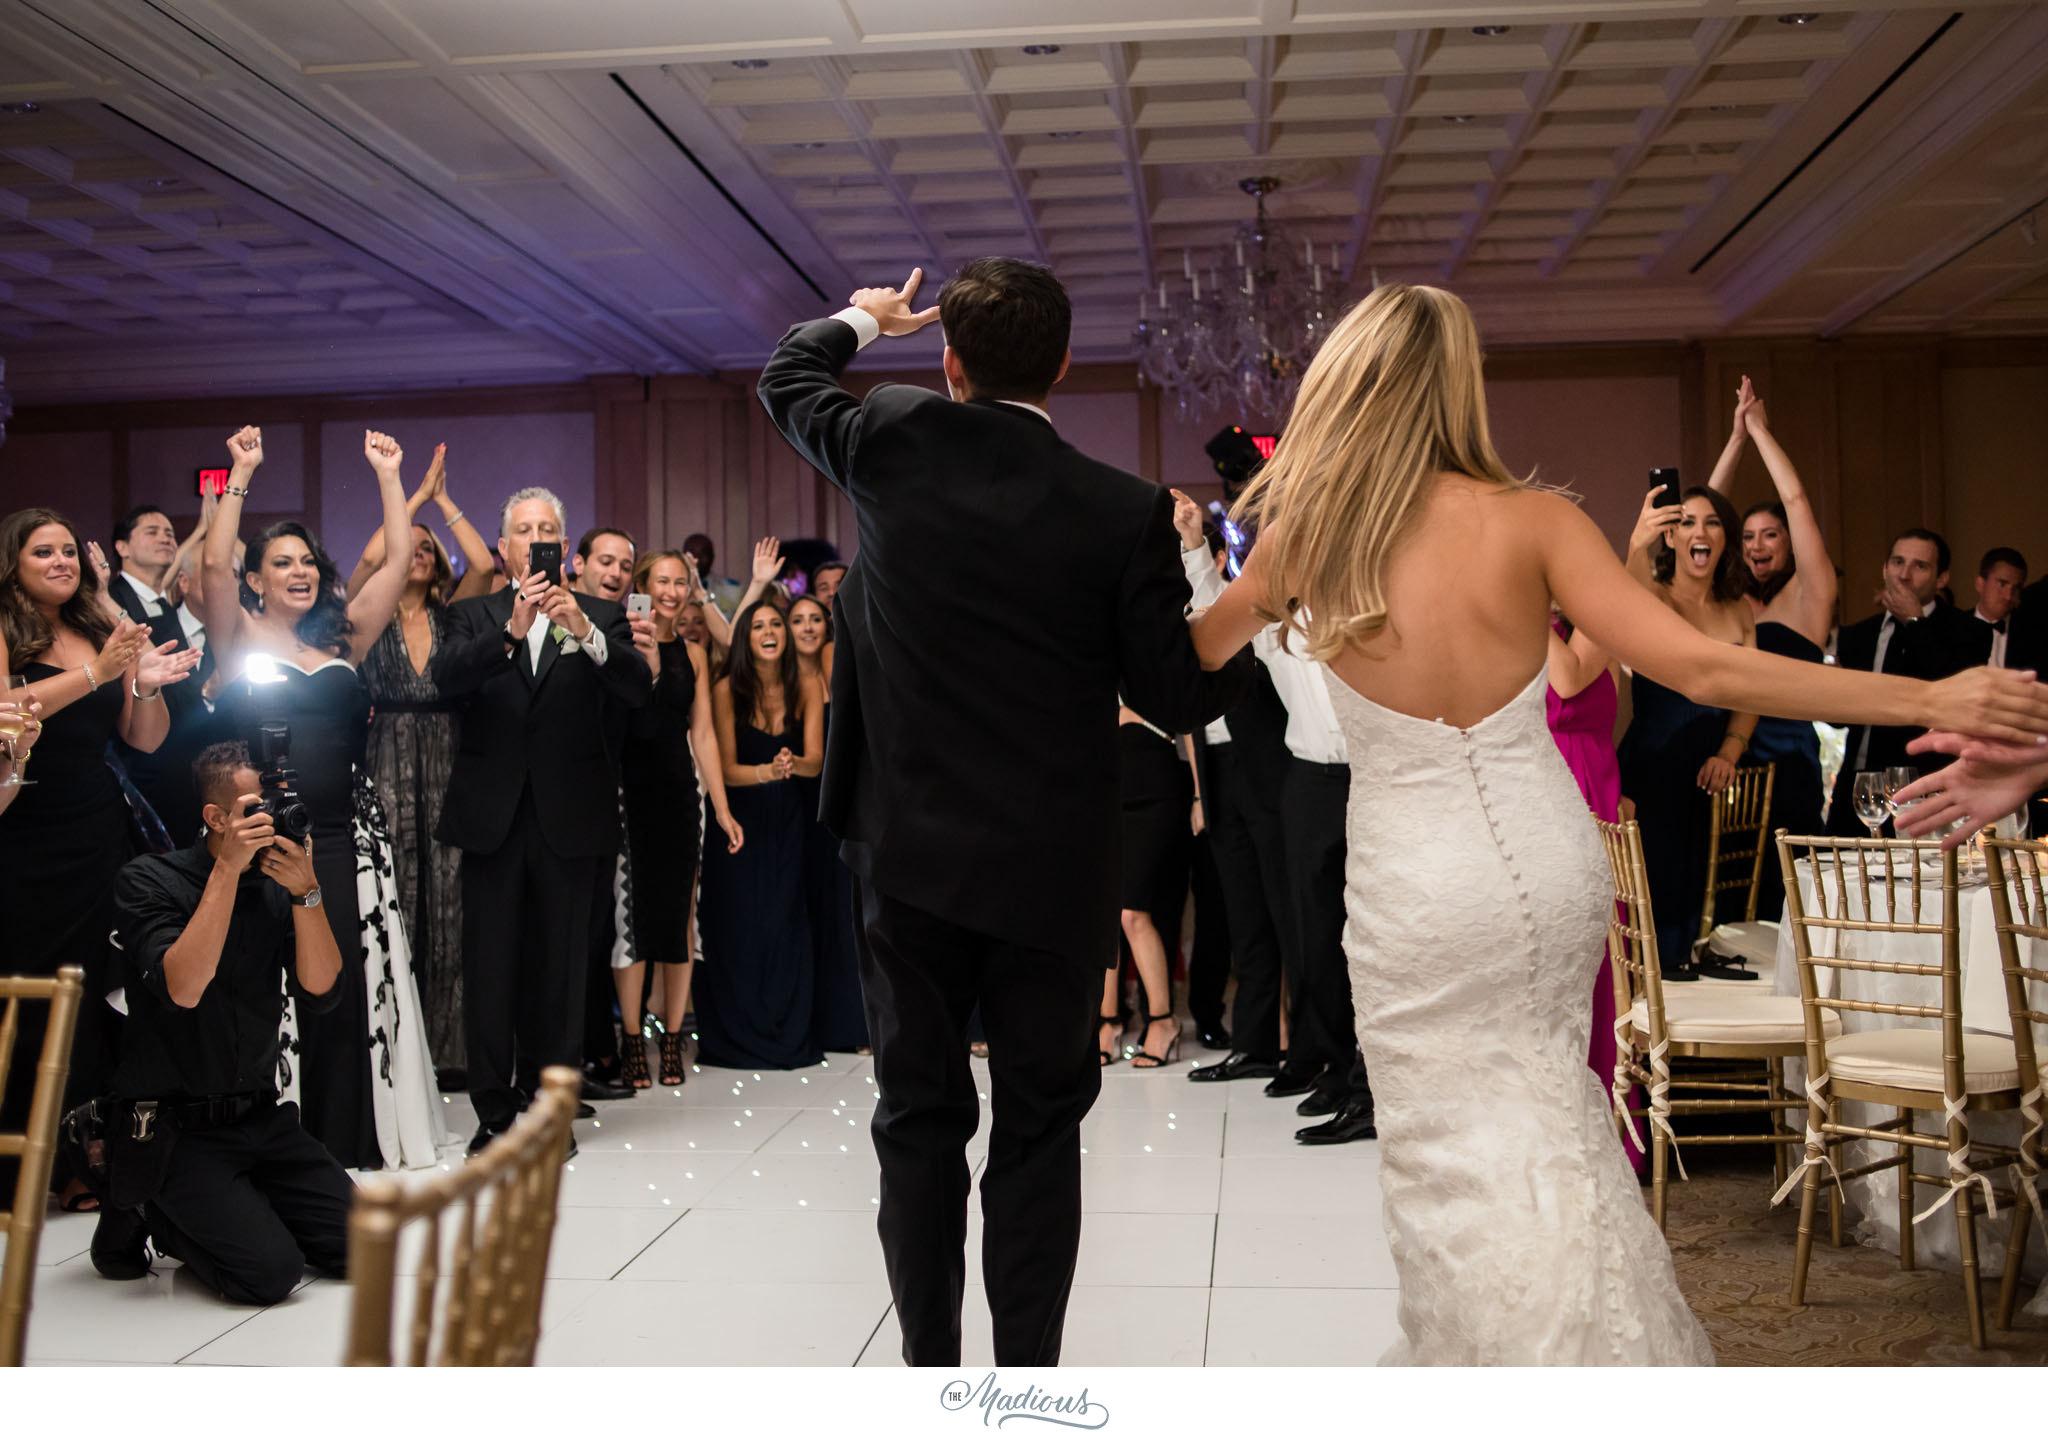 Townsend hotel michigan wedding_43.JPG